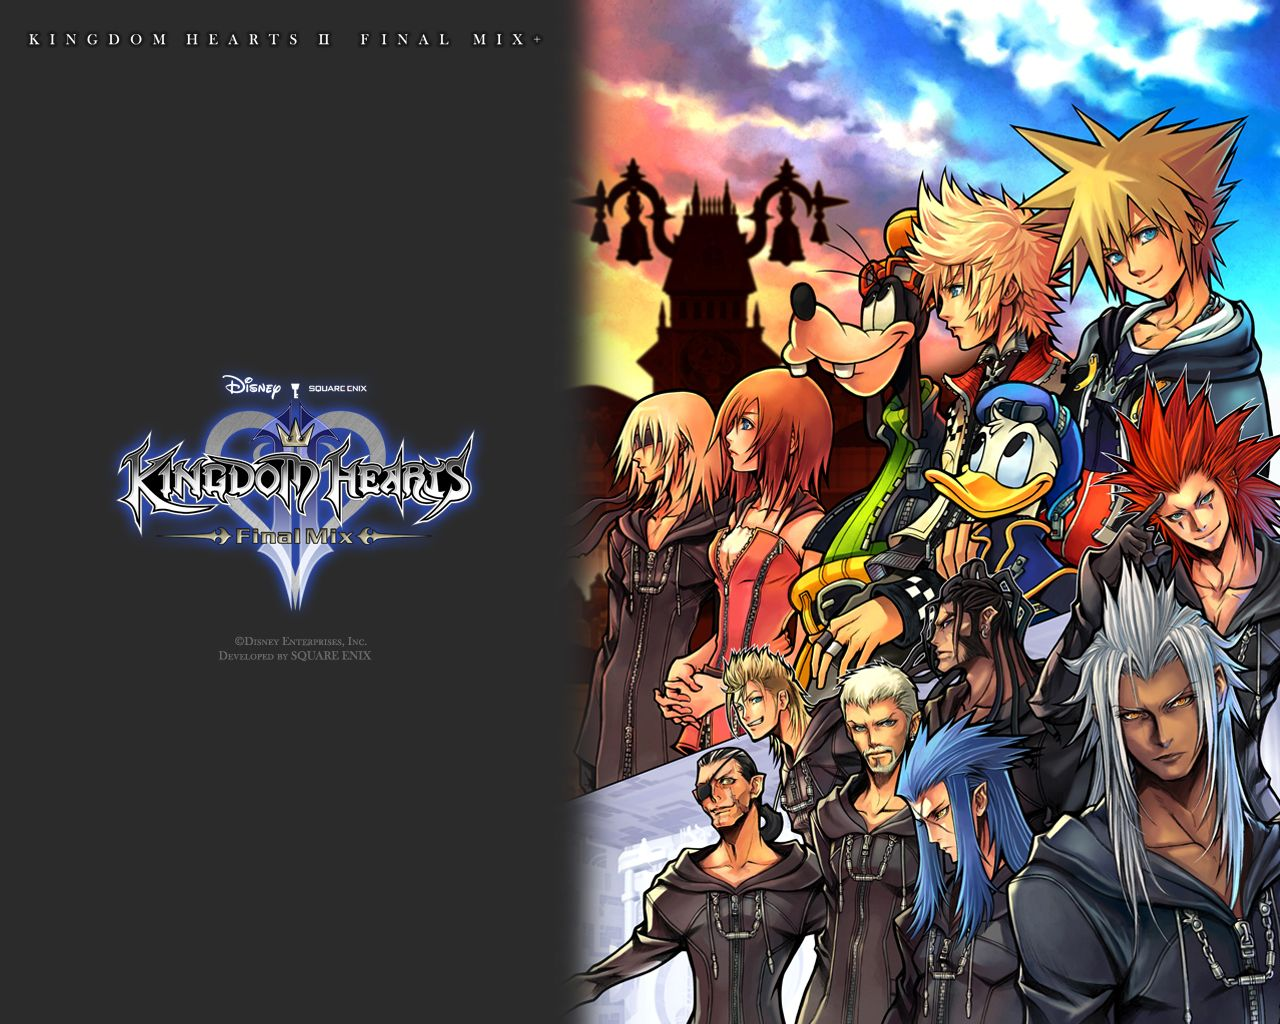 Kingdom Hearts Wallpaper 1920*1080 - Kingdom Hearts , HD Wallpaper & Backgrounds